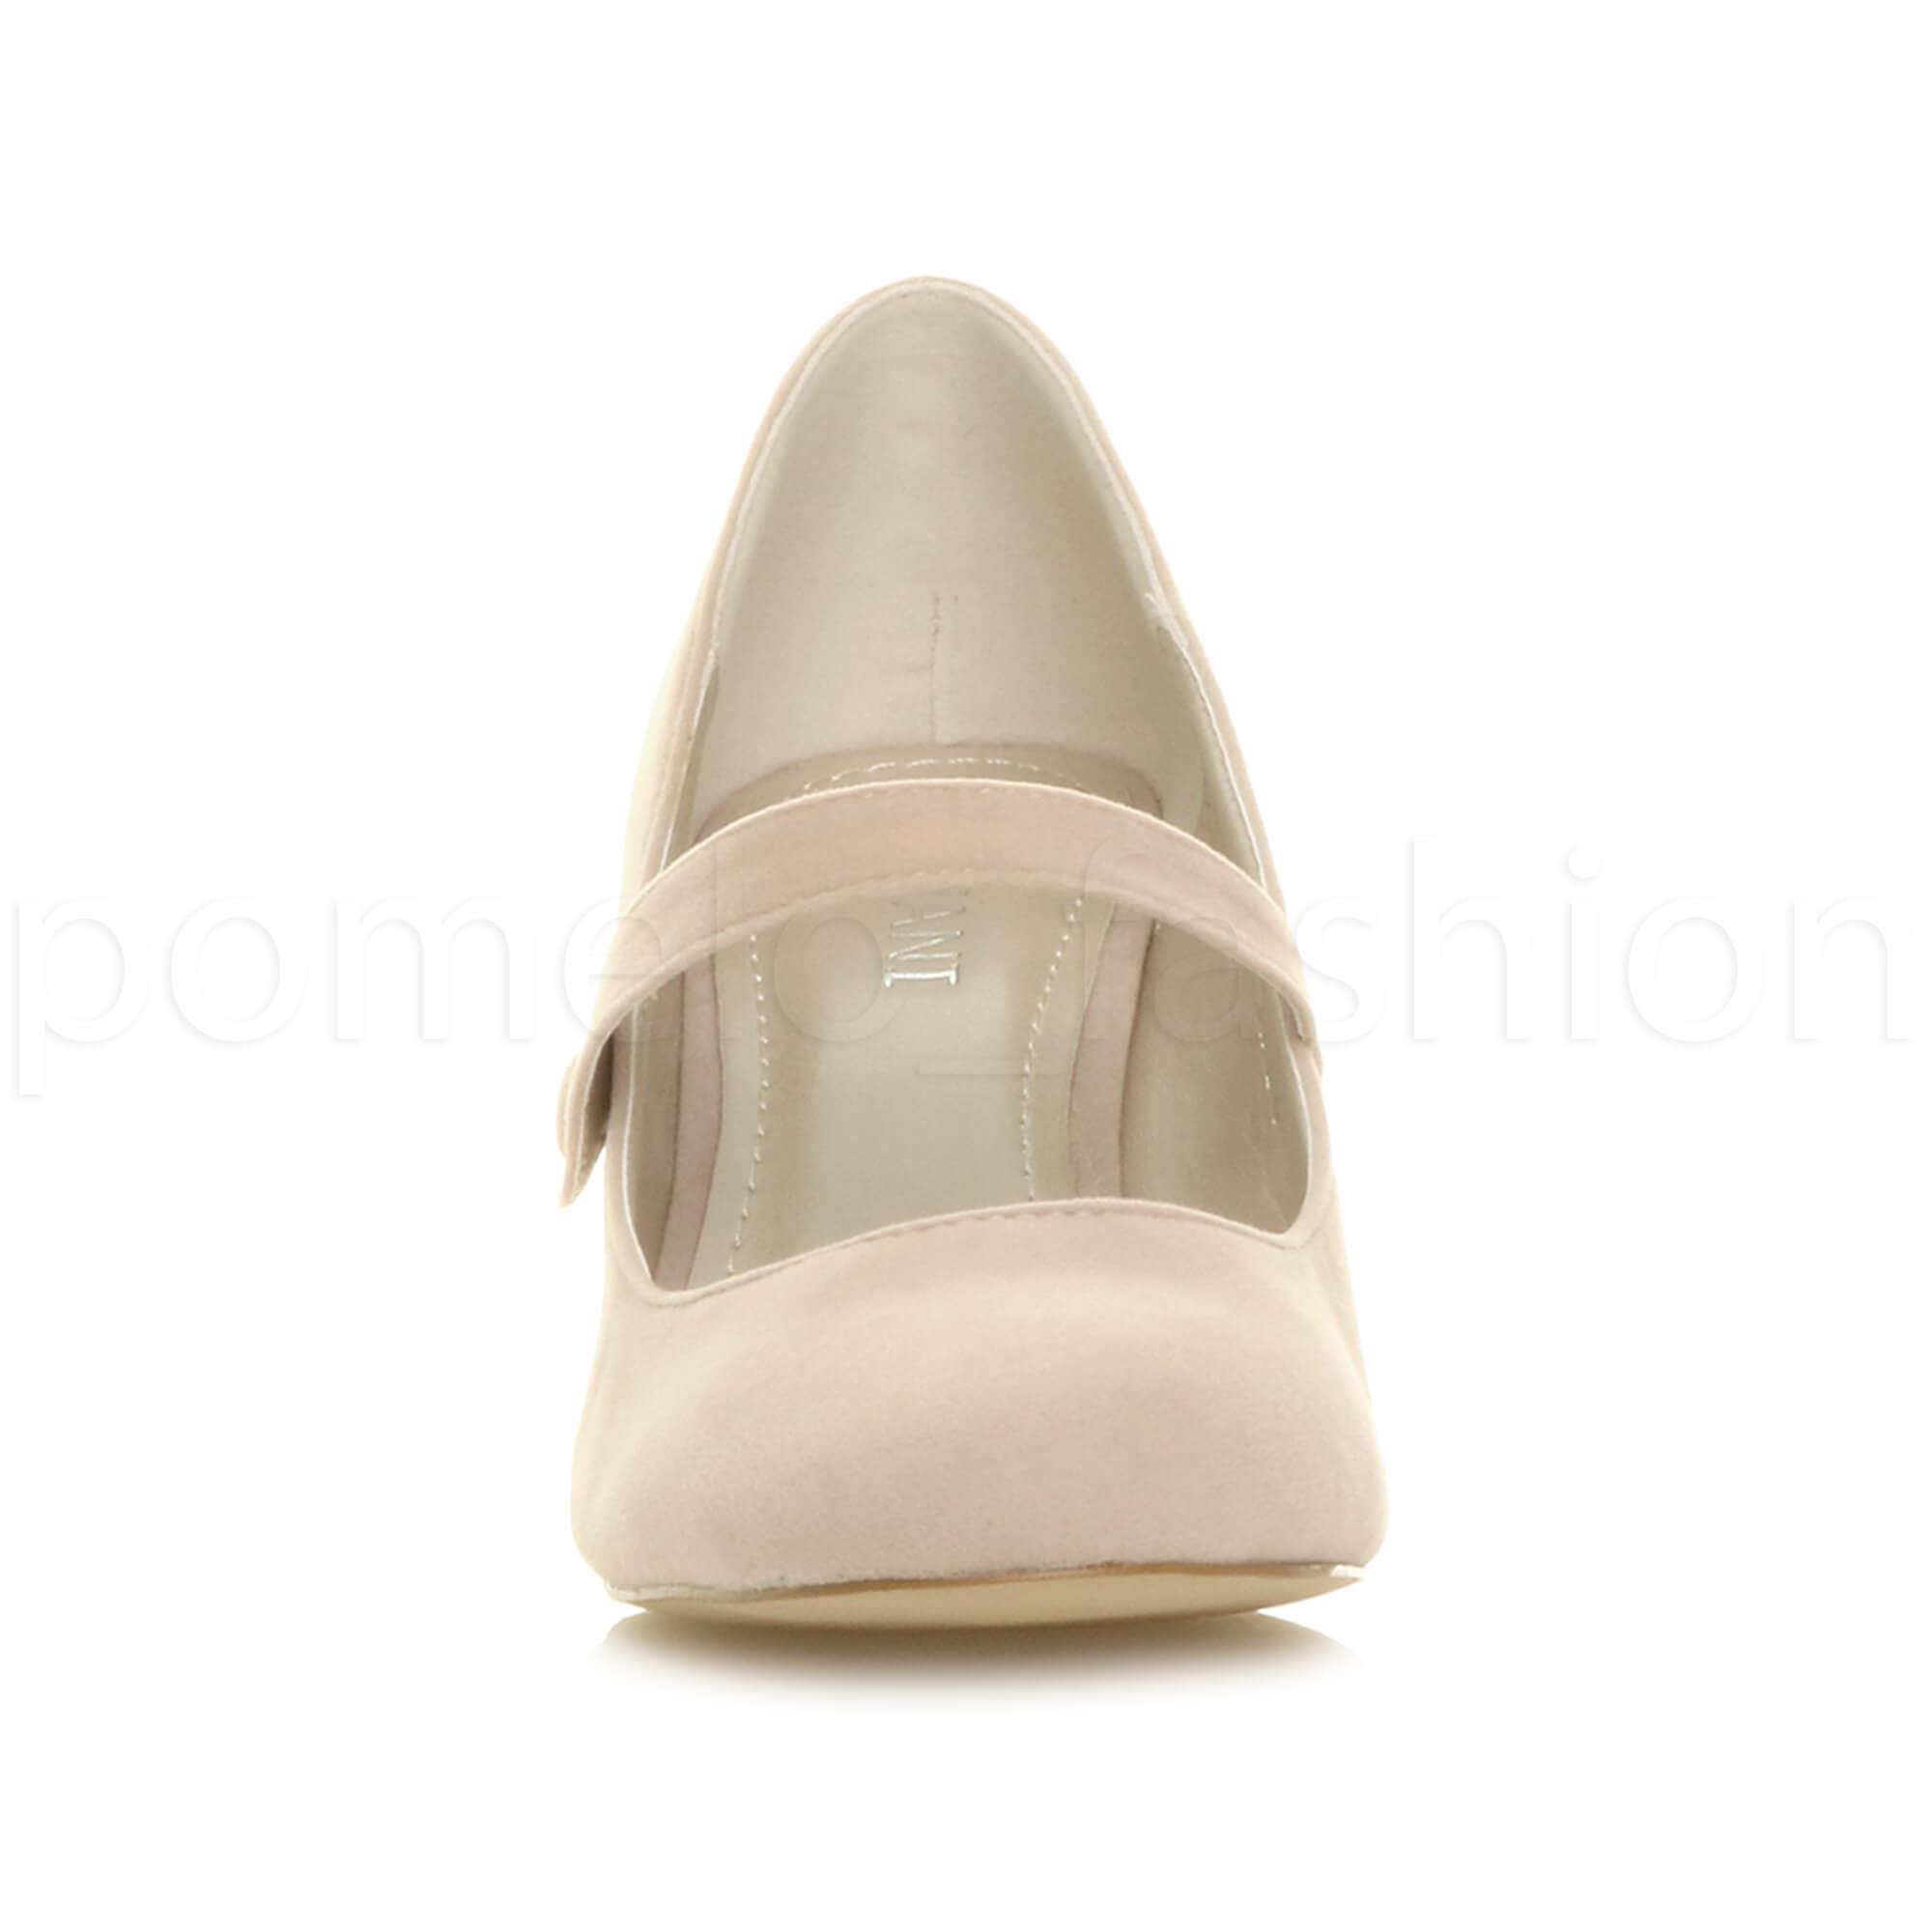 miniatura 125 - Donna basso tacco medio Mary Jane Damigella Matrimonio Pompe Scarpe Da Sera Taglia